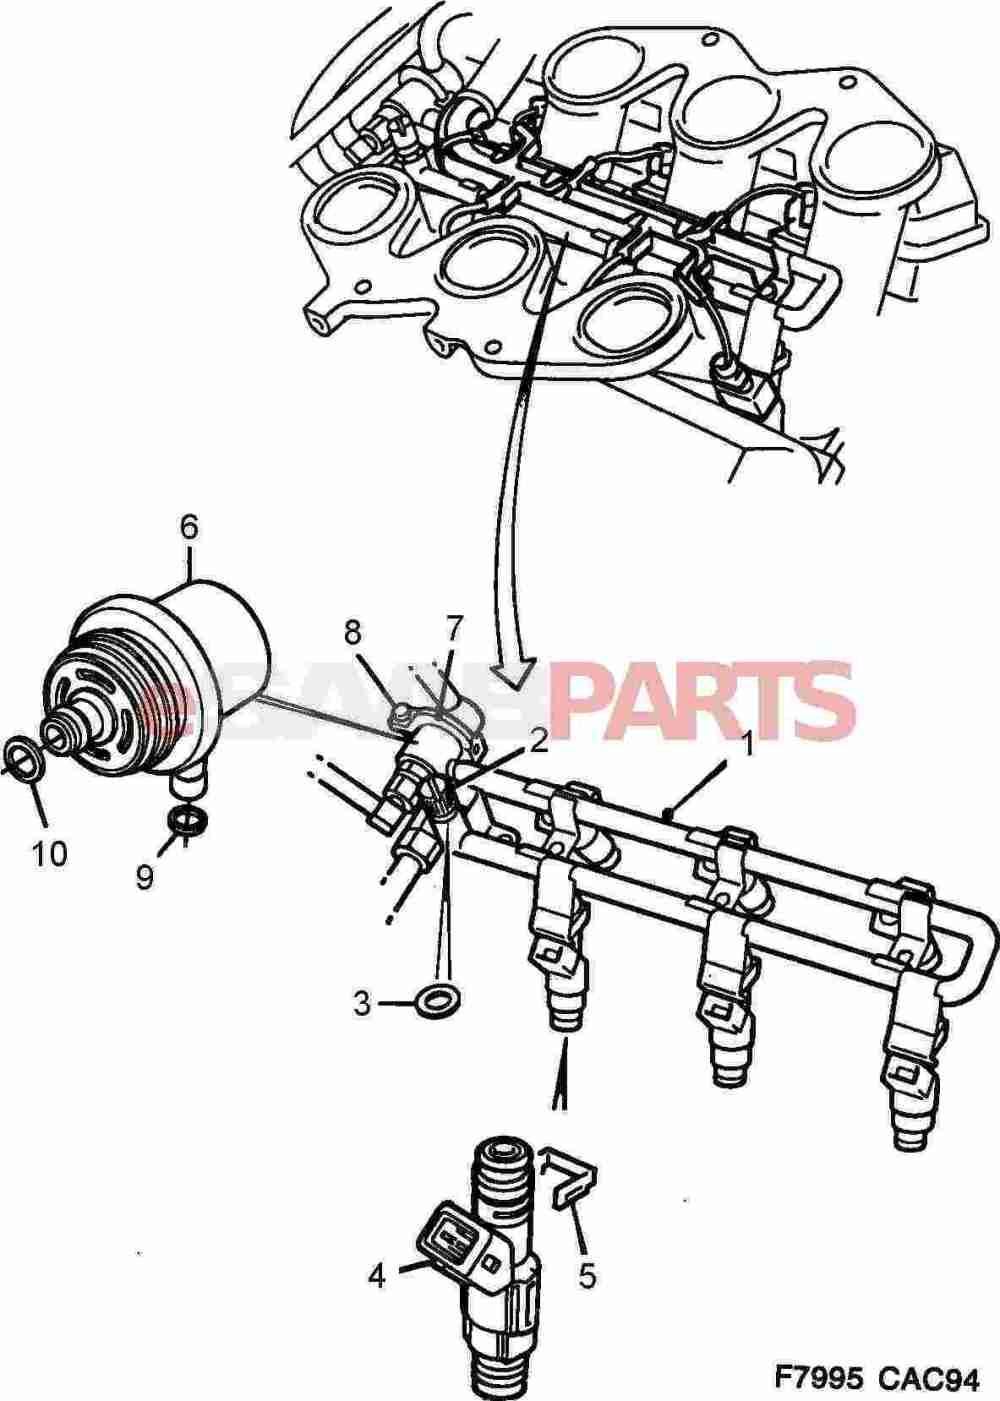 medium resolution of saab 9000 fuel system diagram wiring diagram weeksaab 9000 fuel system diagram wiring diagram today saab